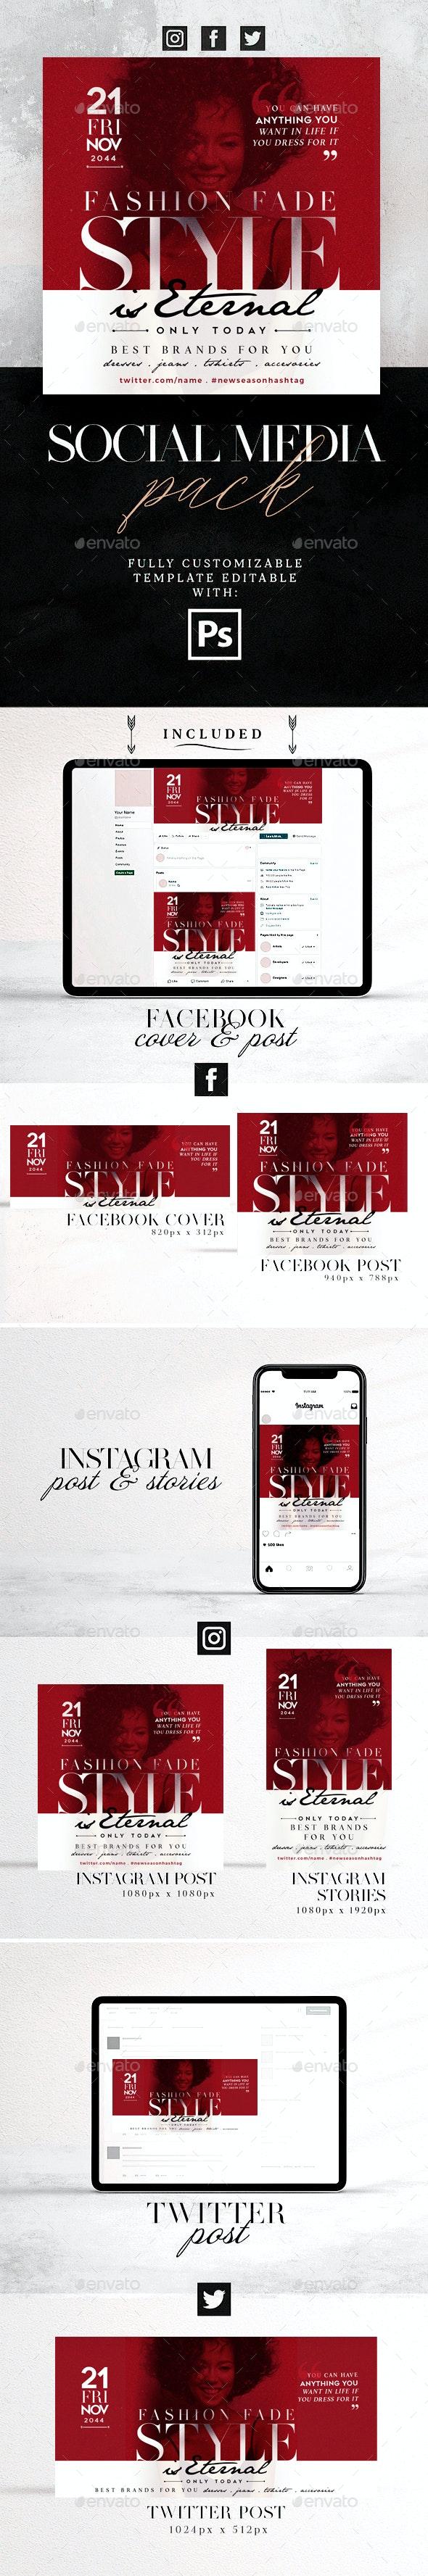 Style Is Eternal Social Media Pack - Social Media Web Elements